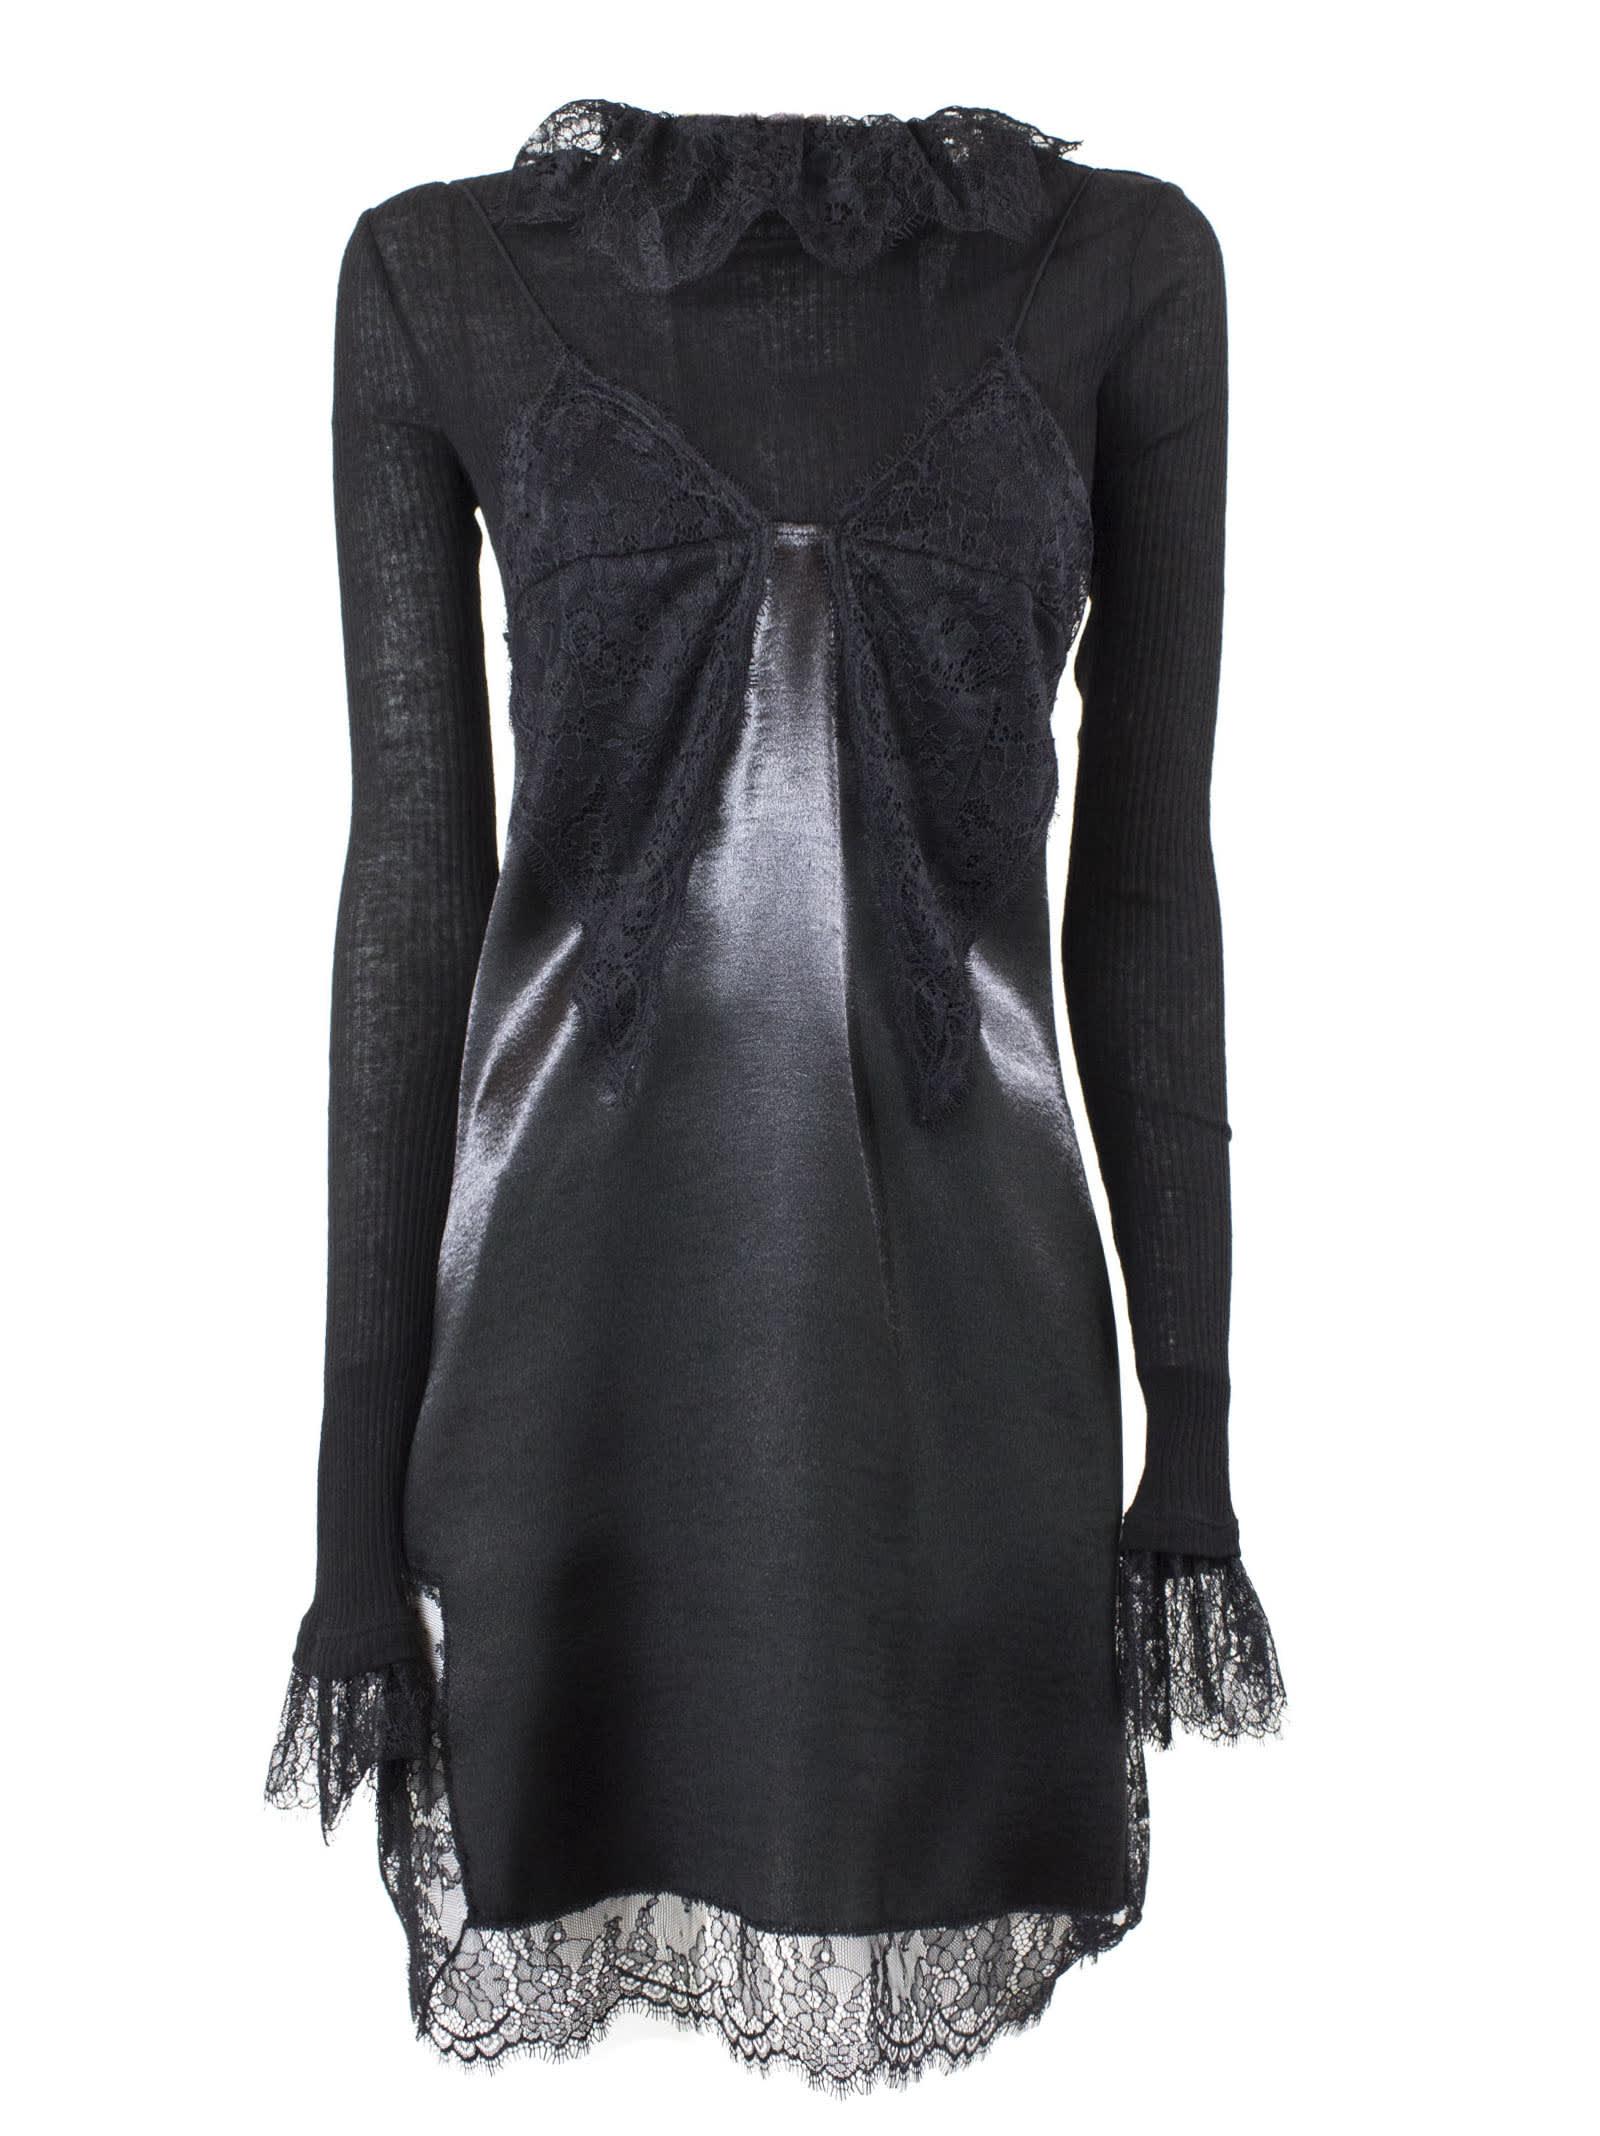 Philosophy di Lorenzo Serafini Black Lace Shift Dress